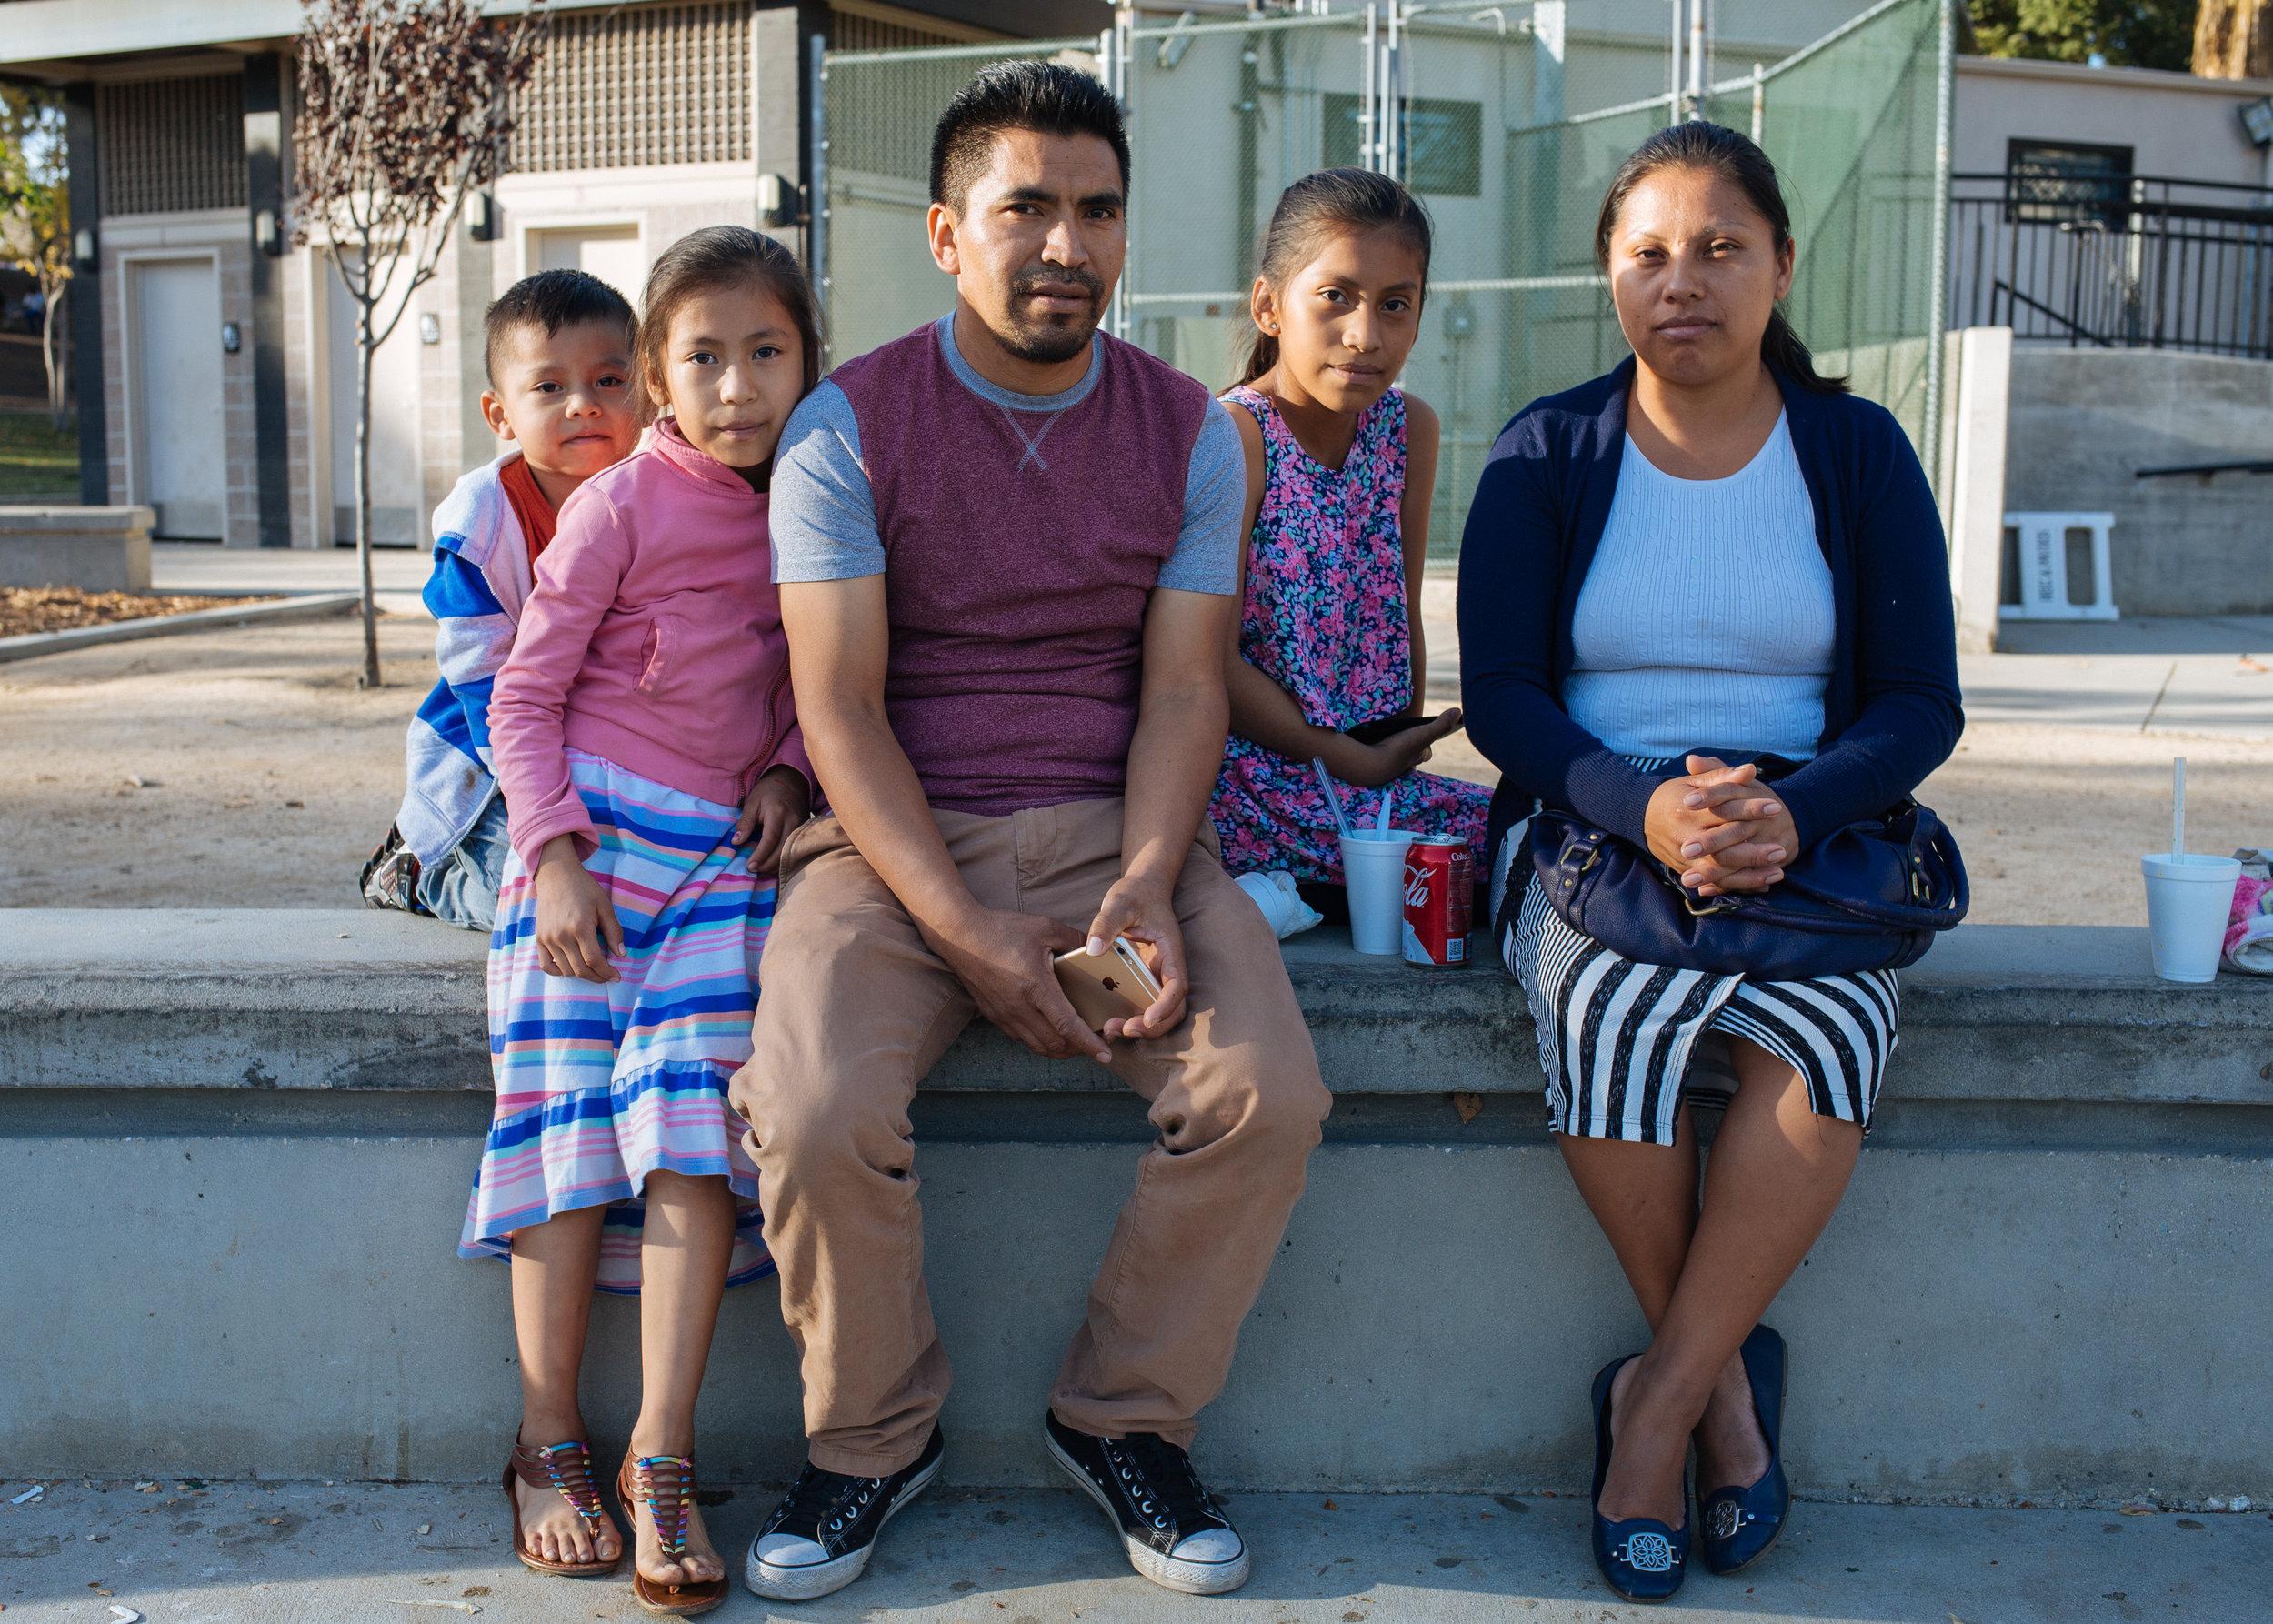 Family at the park, MacArthur Park, California 2016